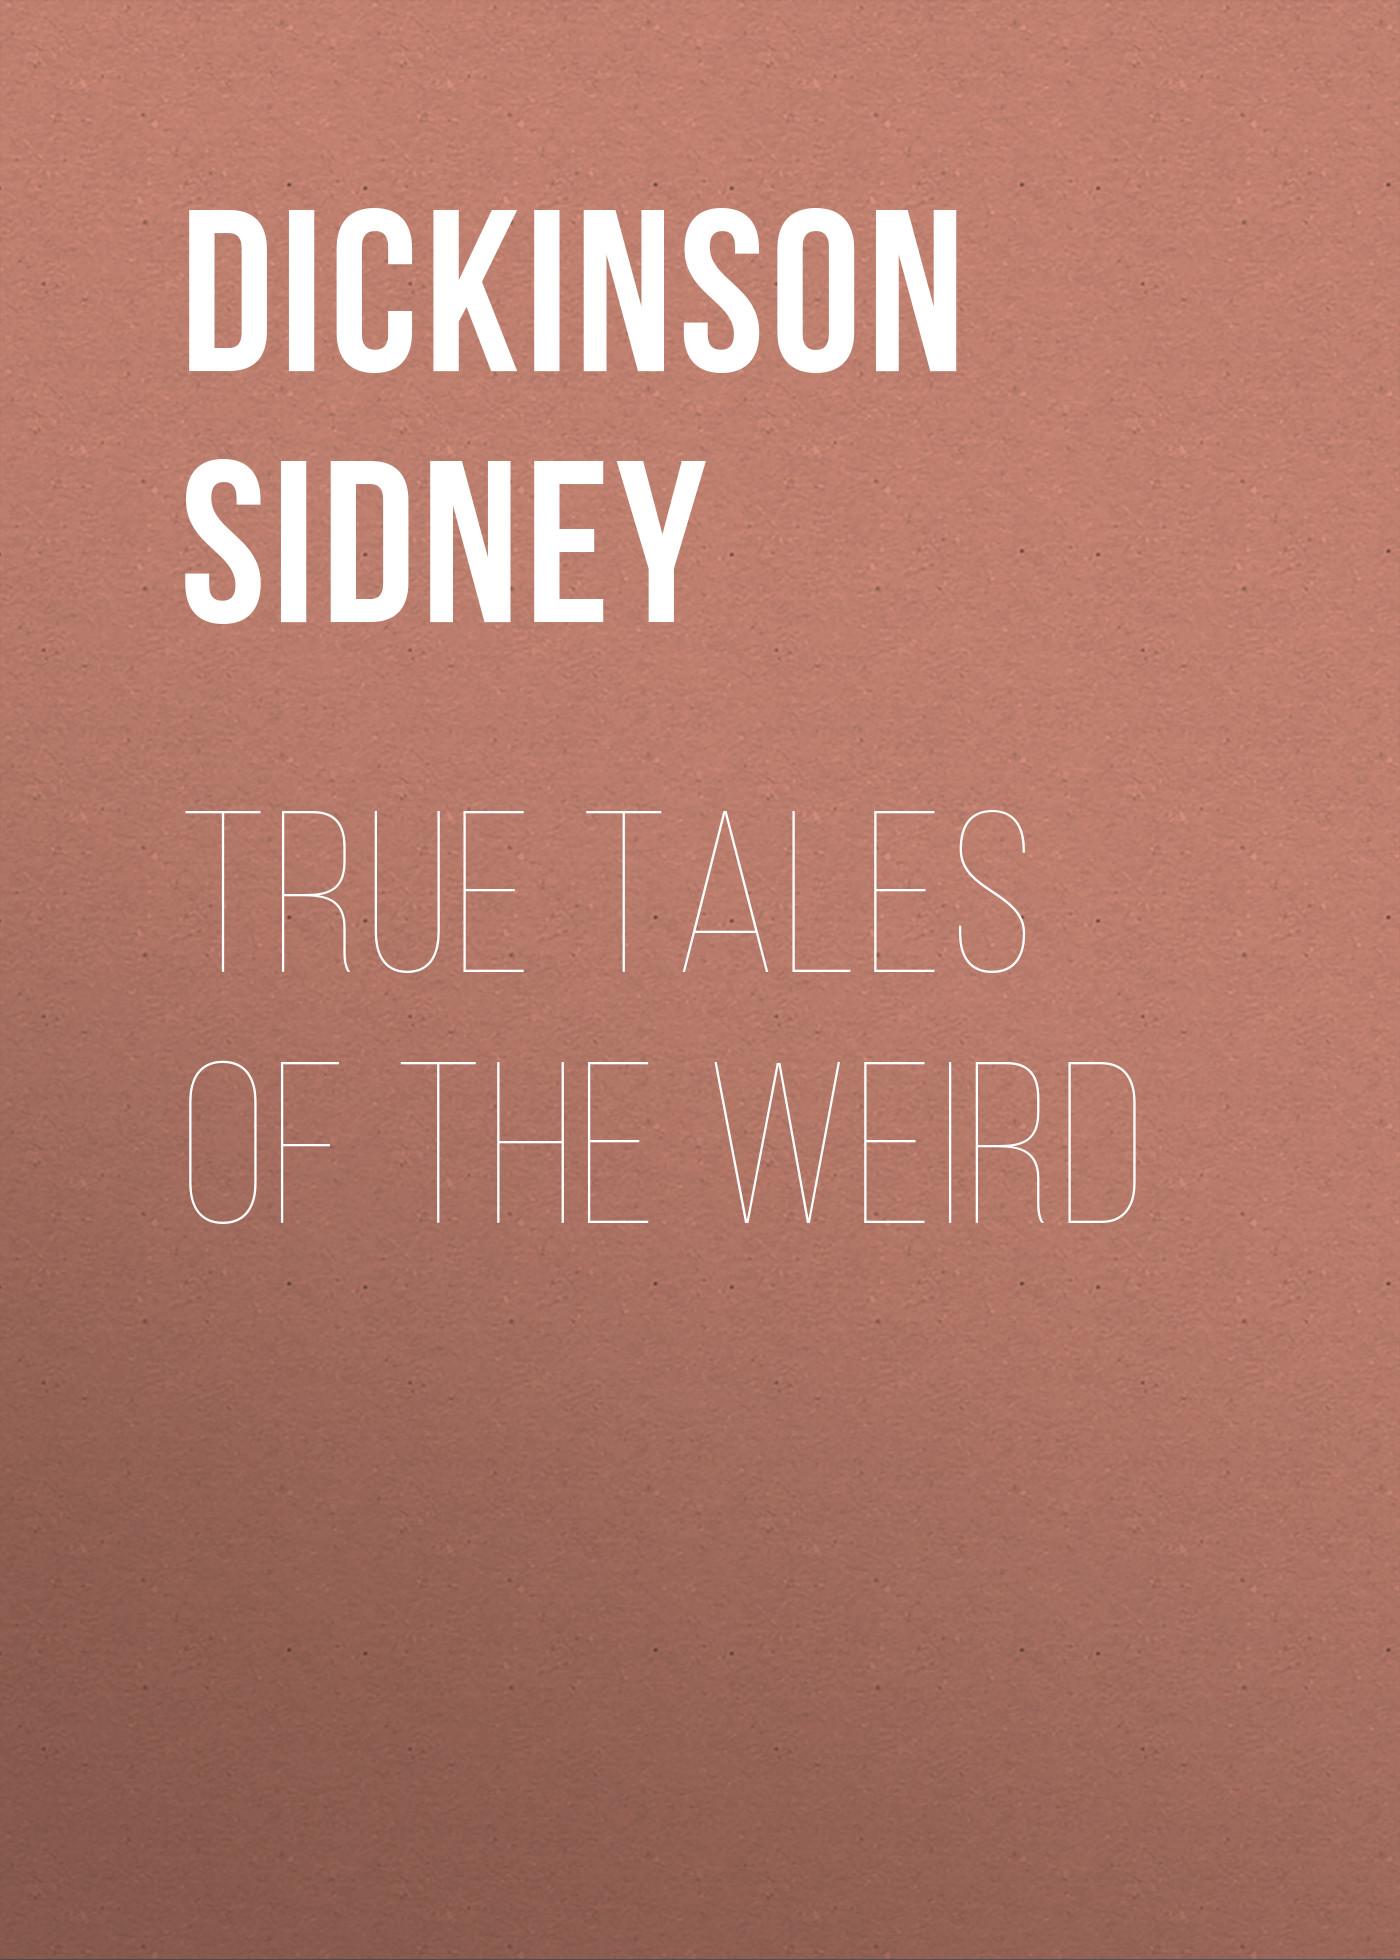 Dickinson Sidney True Tales of the Weird цена